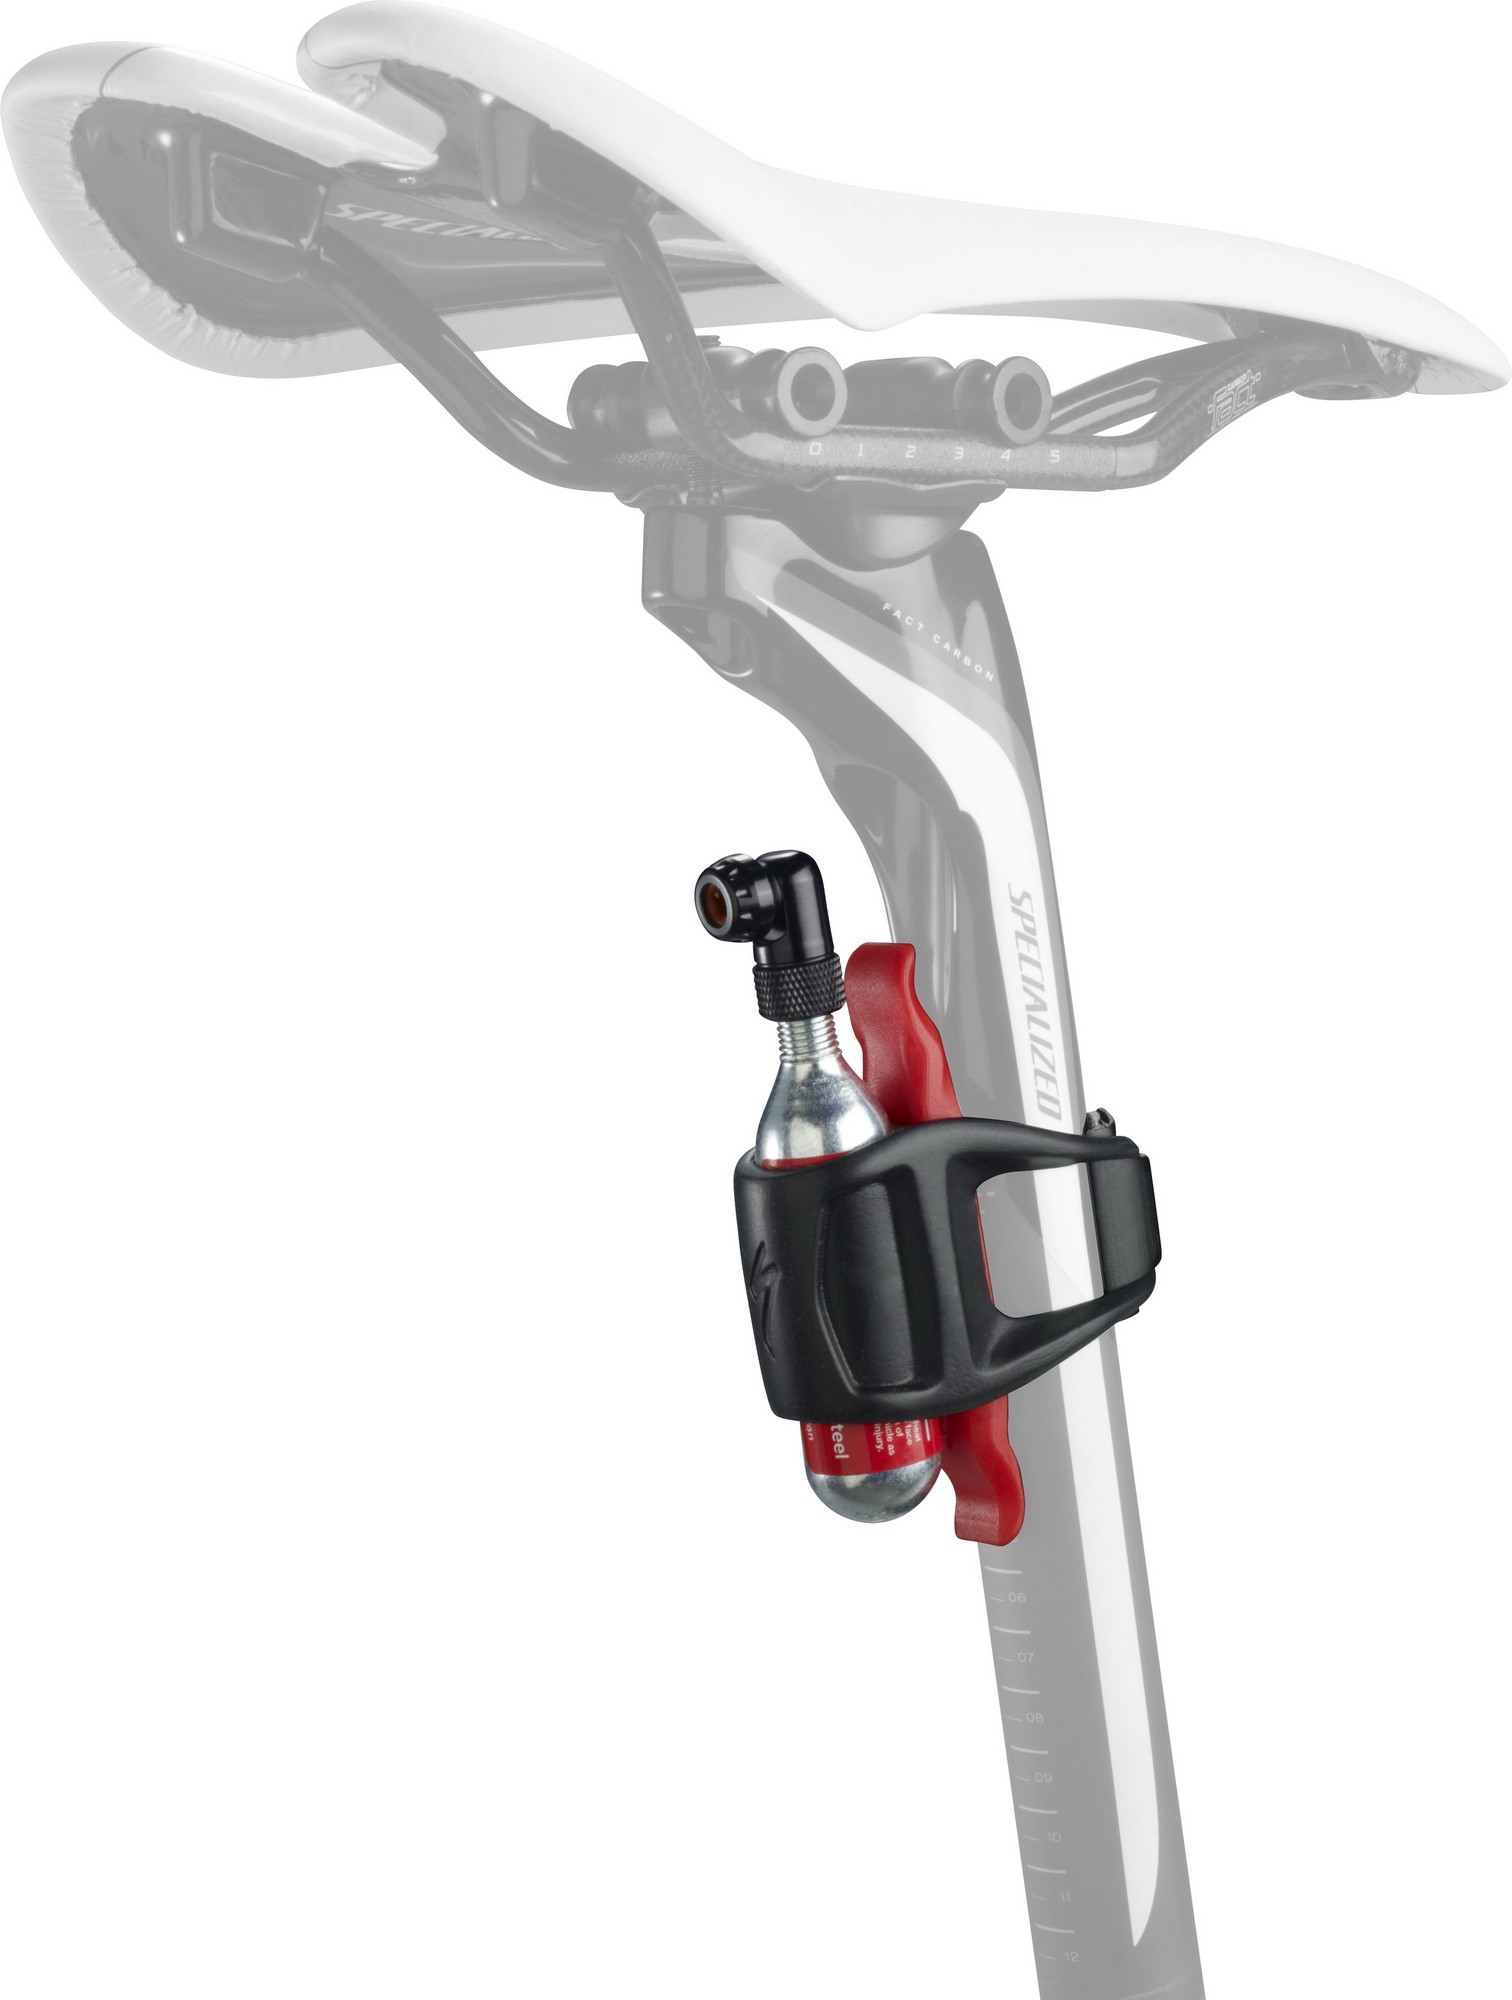 Pumpa Specialized Air Tool CO2 Mini Kit 16g black 2019 Barva: černá